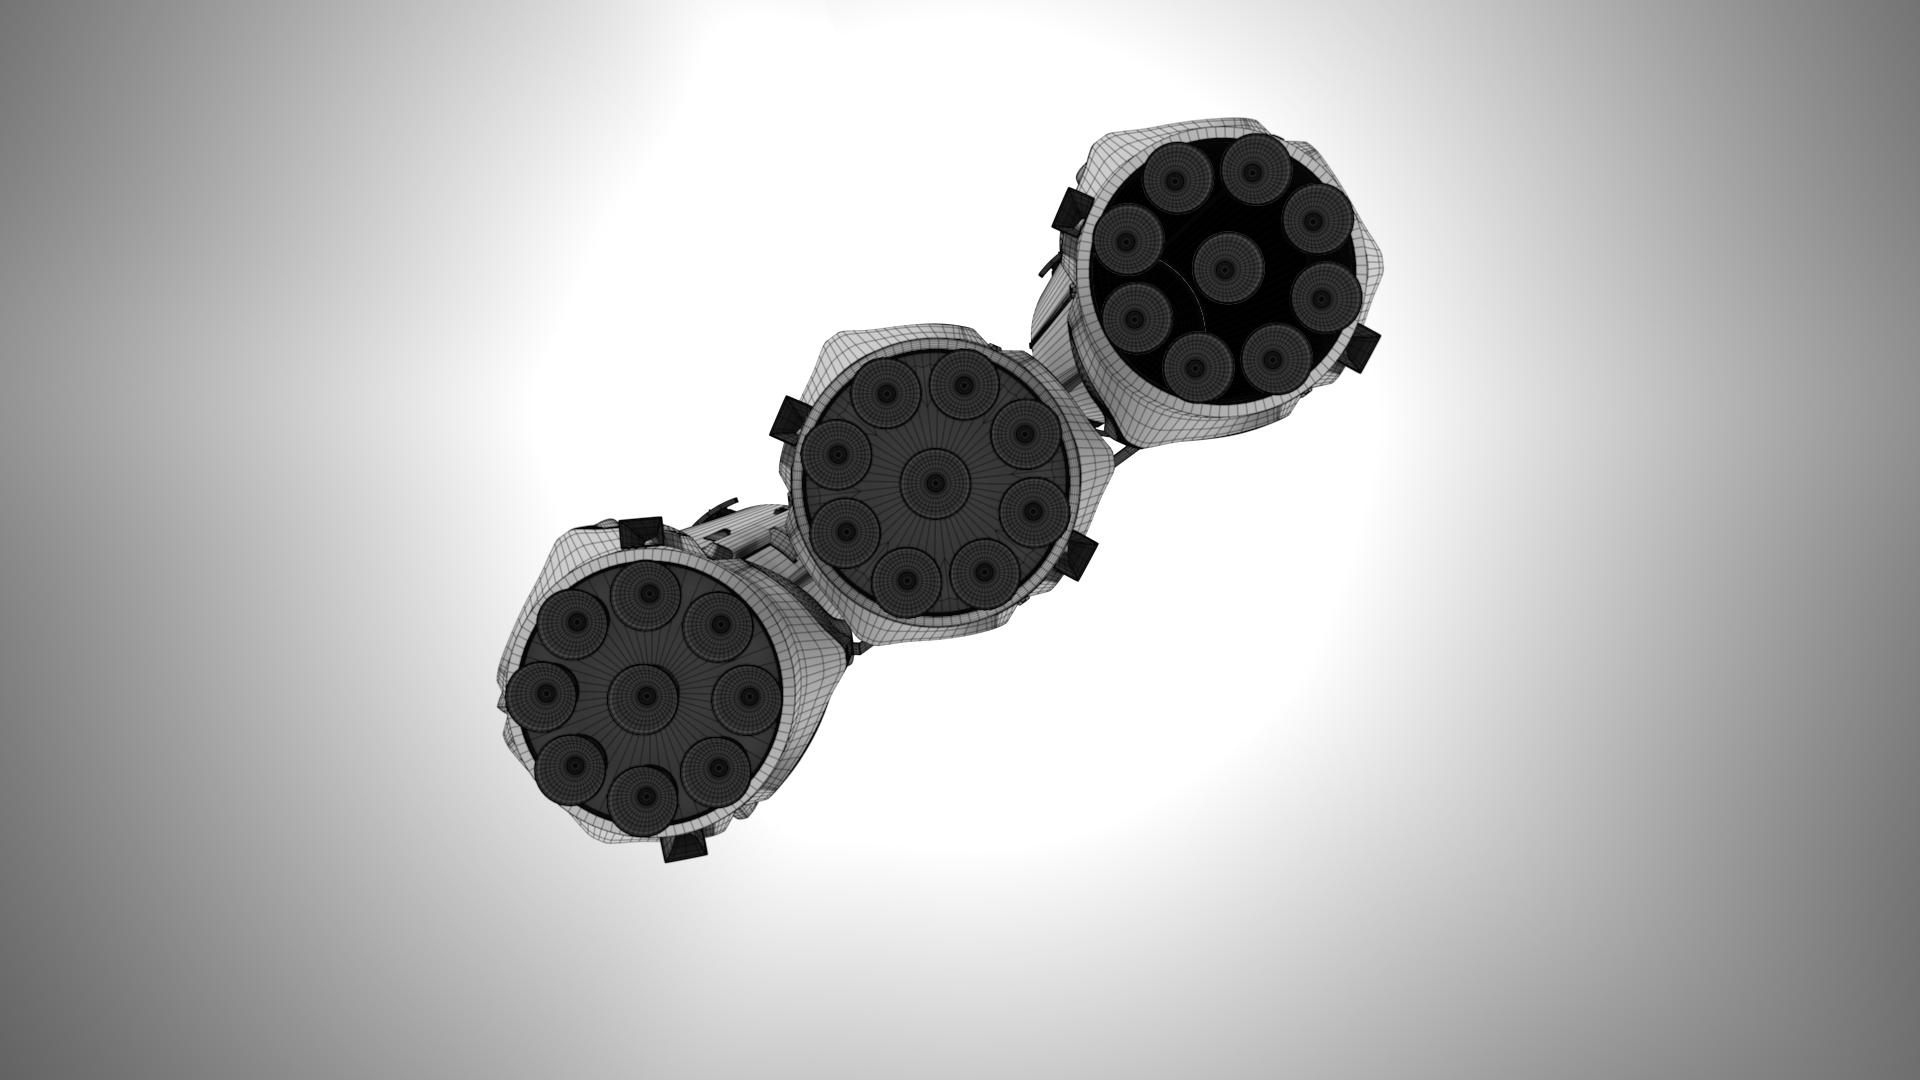 falcon heavy v1.2 fully reusable 3d model max fbx c4d lwo ma mb hrc xsi obj 277871